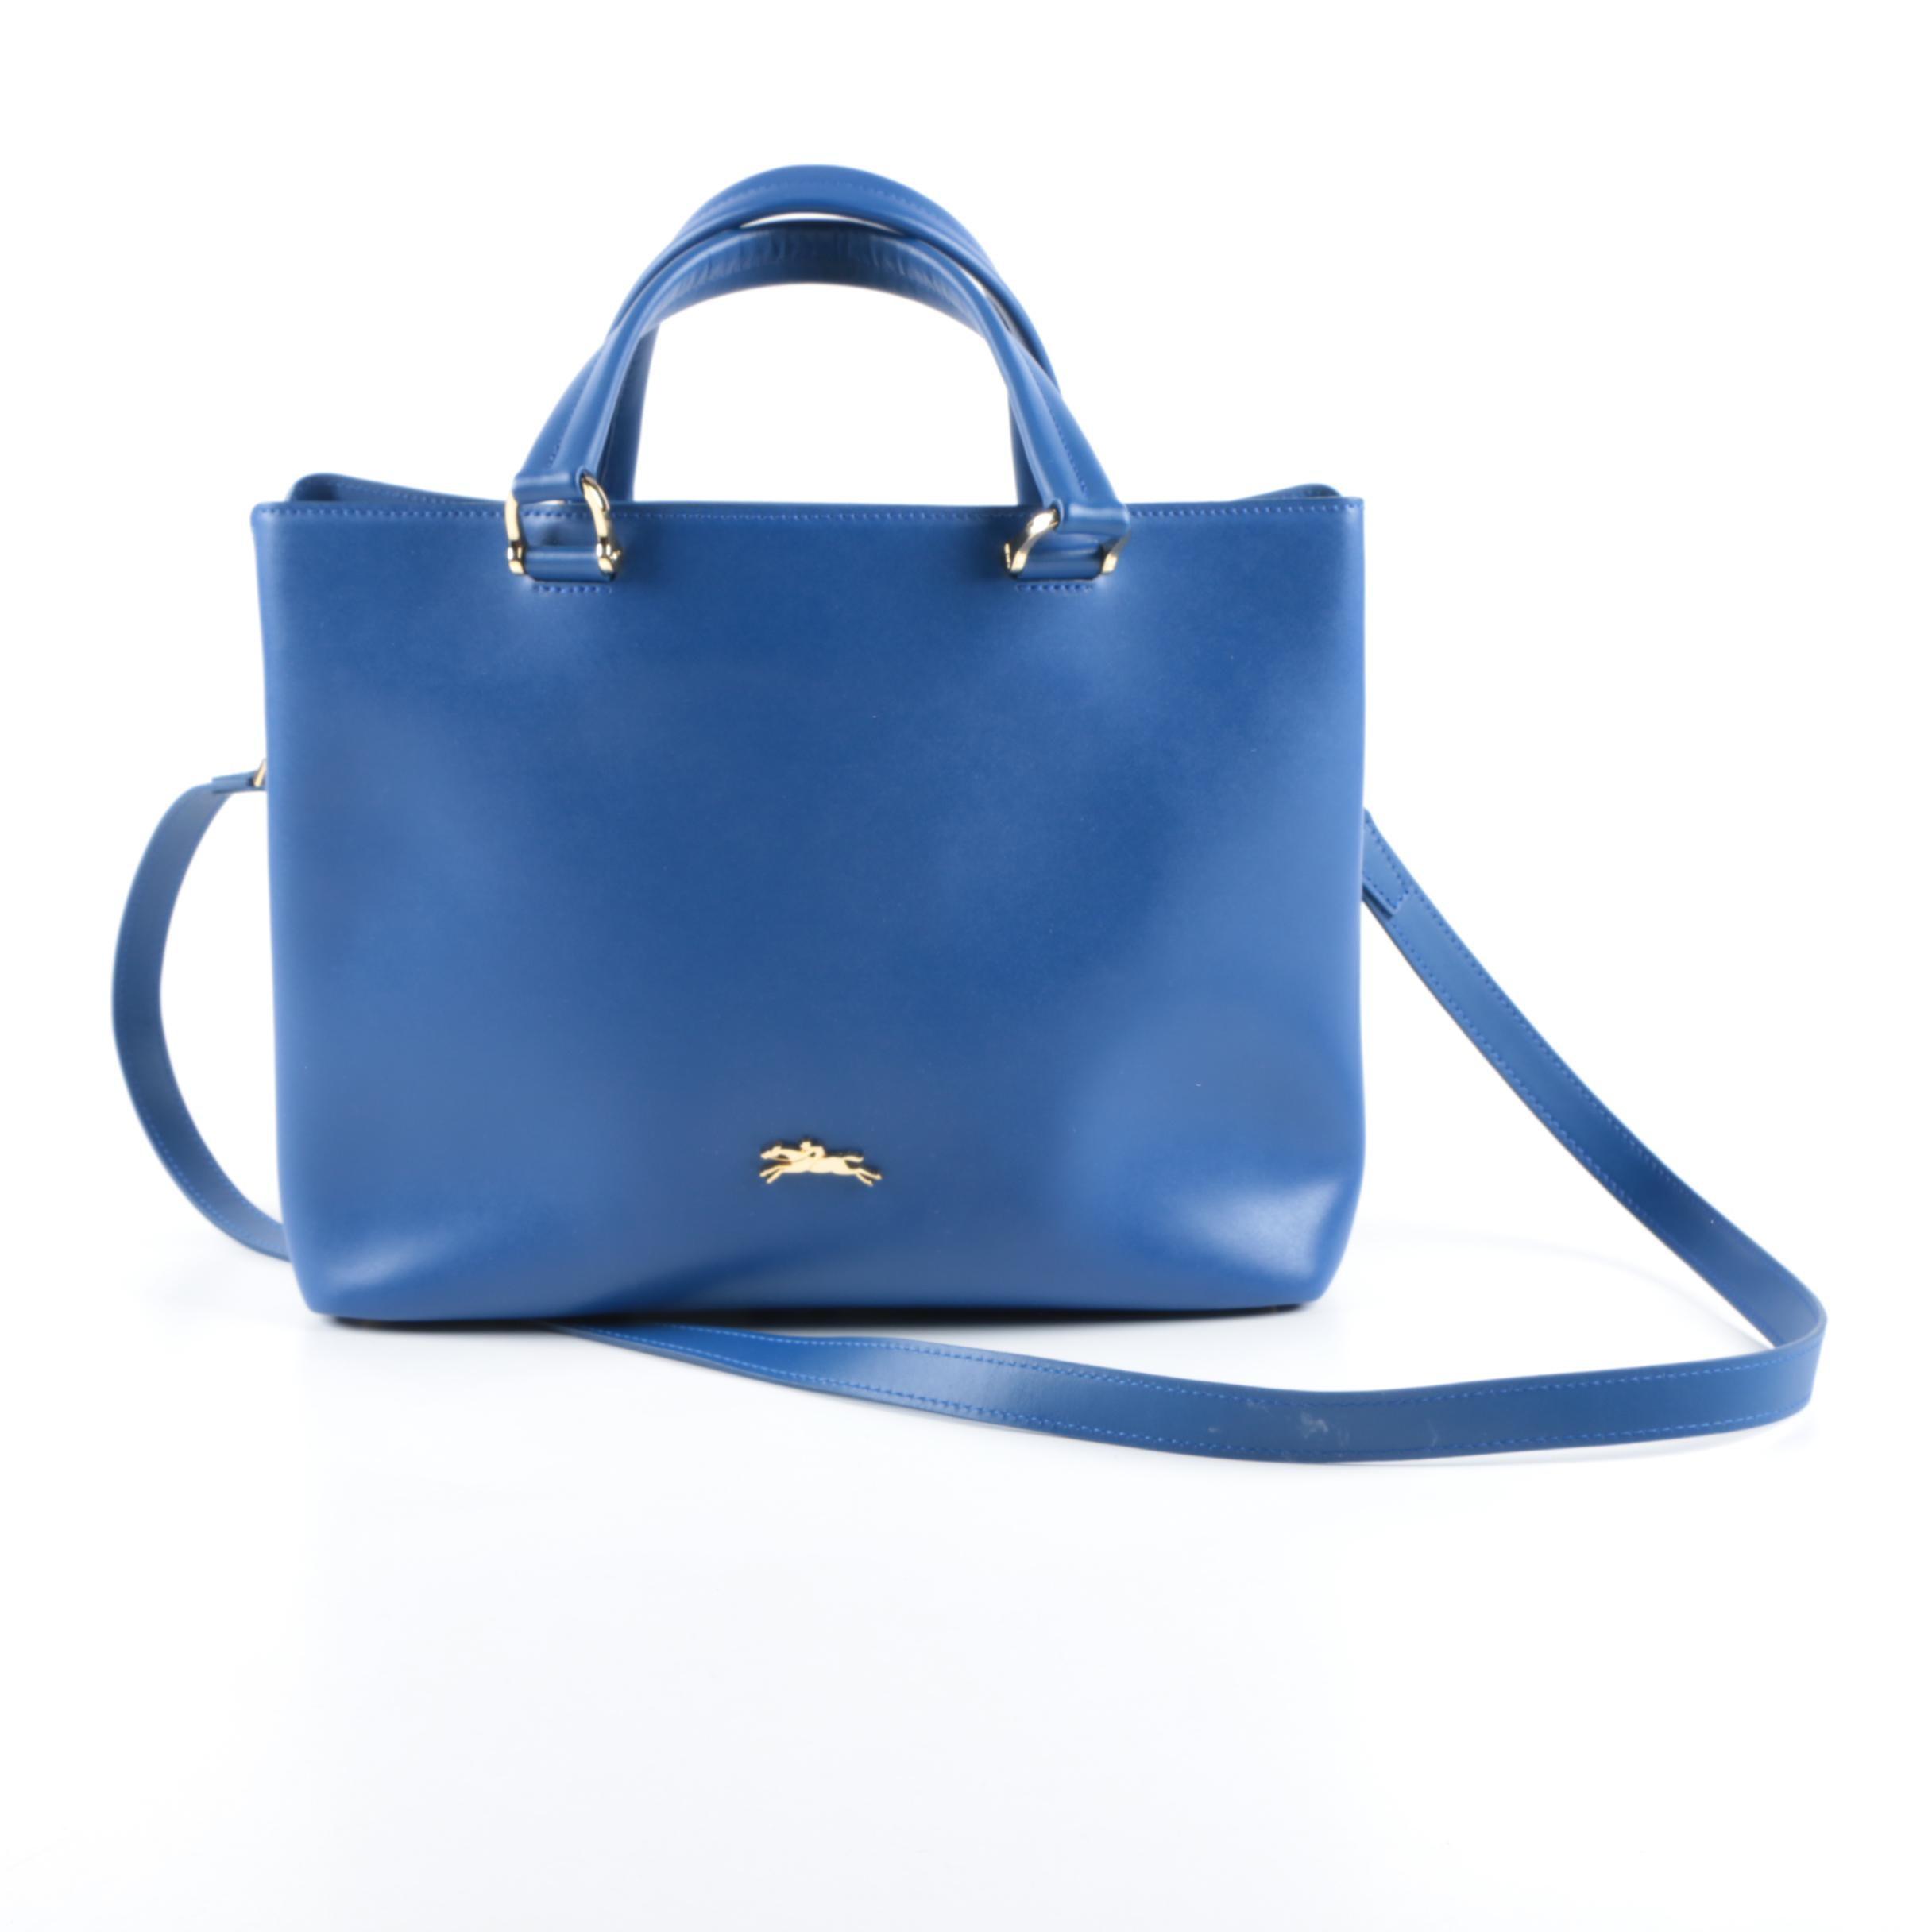 Longchamp Blue Leather Tote Bag